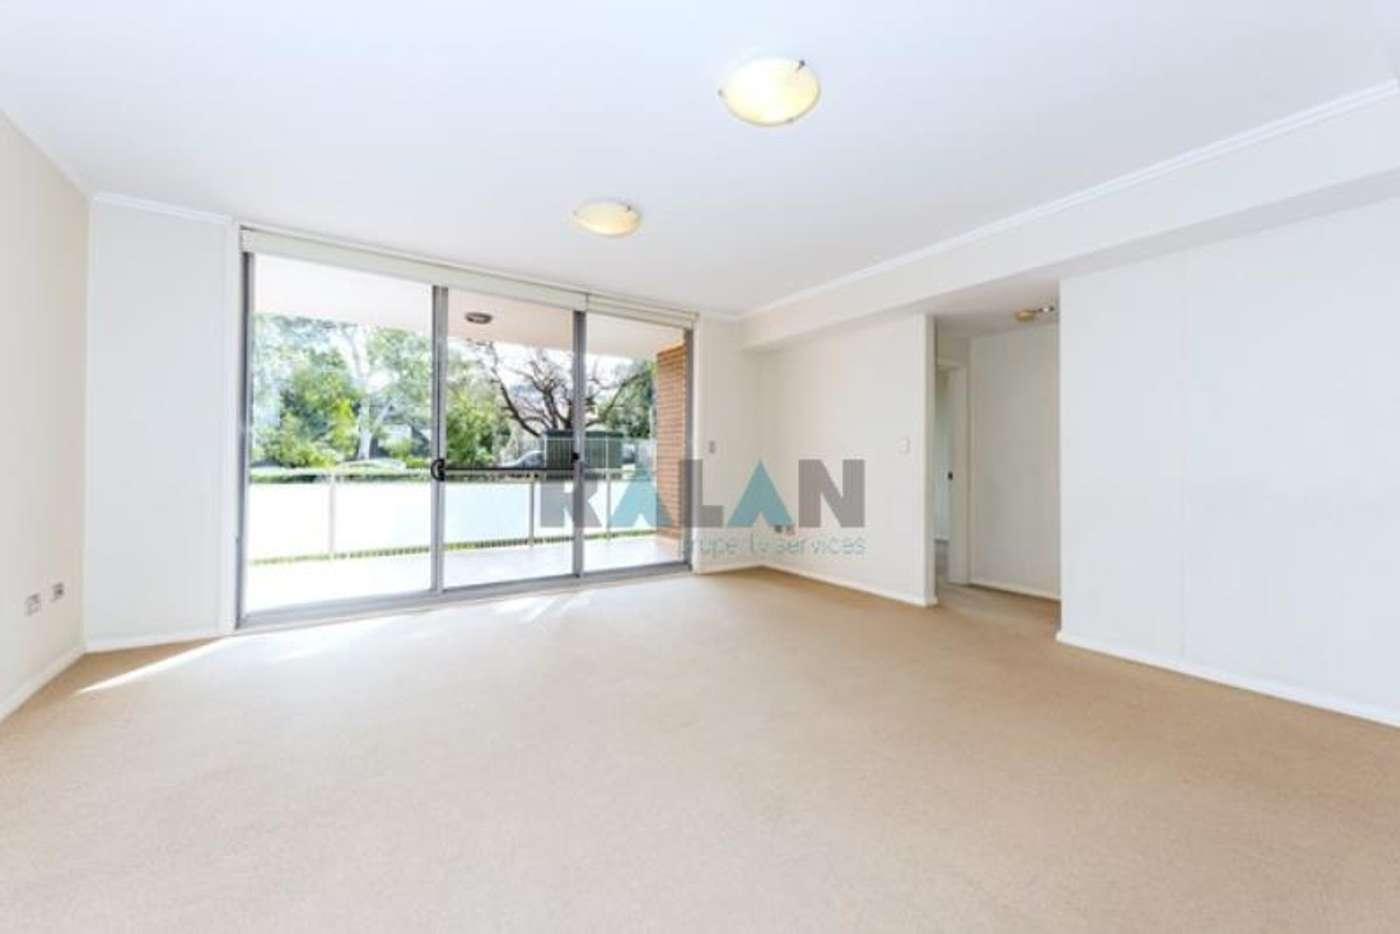 Main view of Homely apartment listing, 32/16-22 Dumaresq Street, Gordon NSW 2072